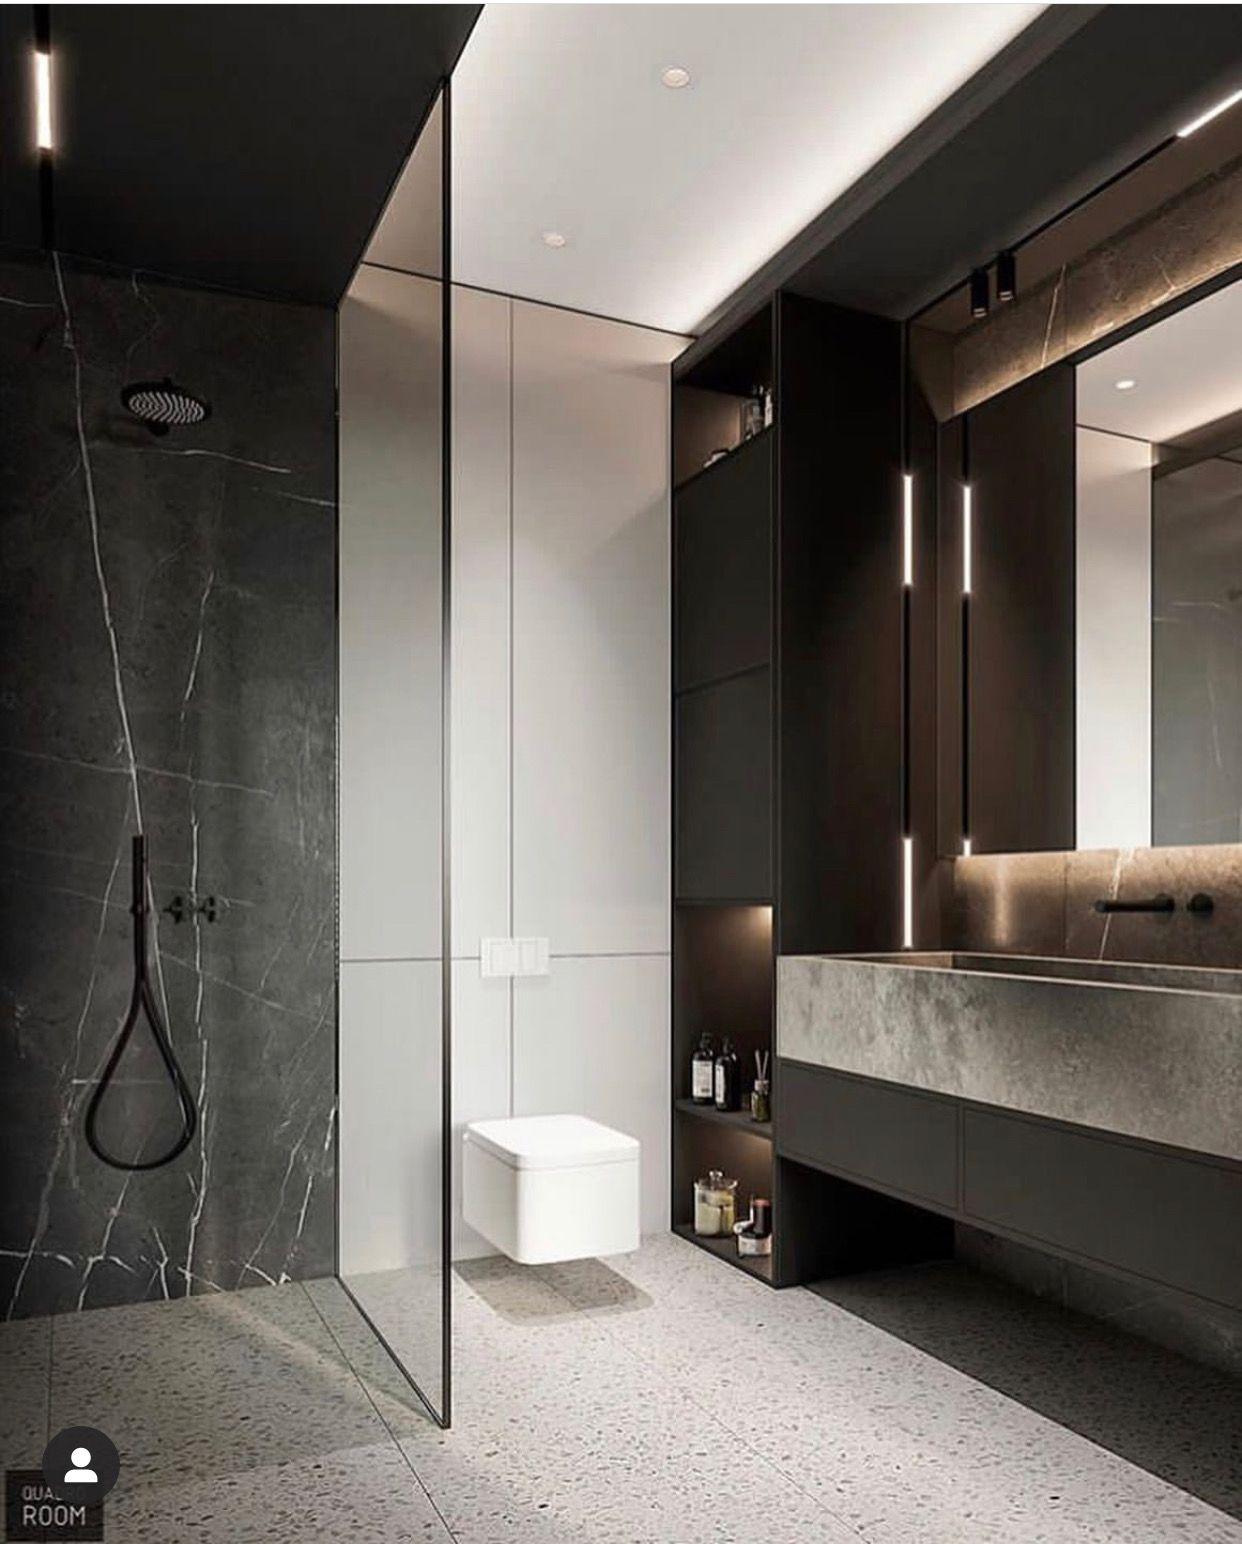 Pin by Maja Šmitran on Kupaonica | Bathroom interior ...